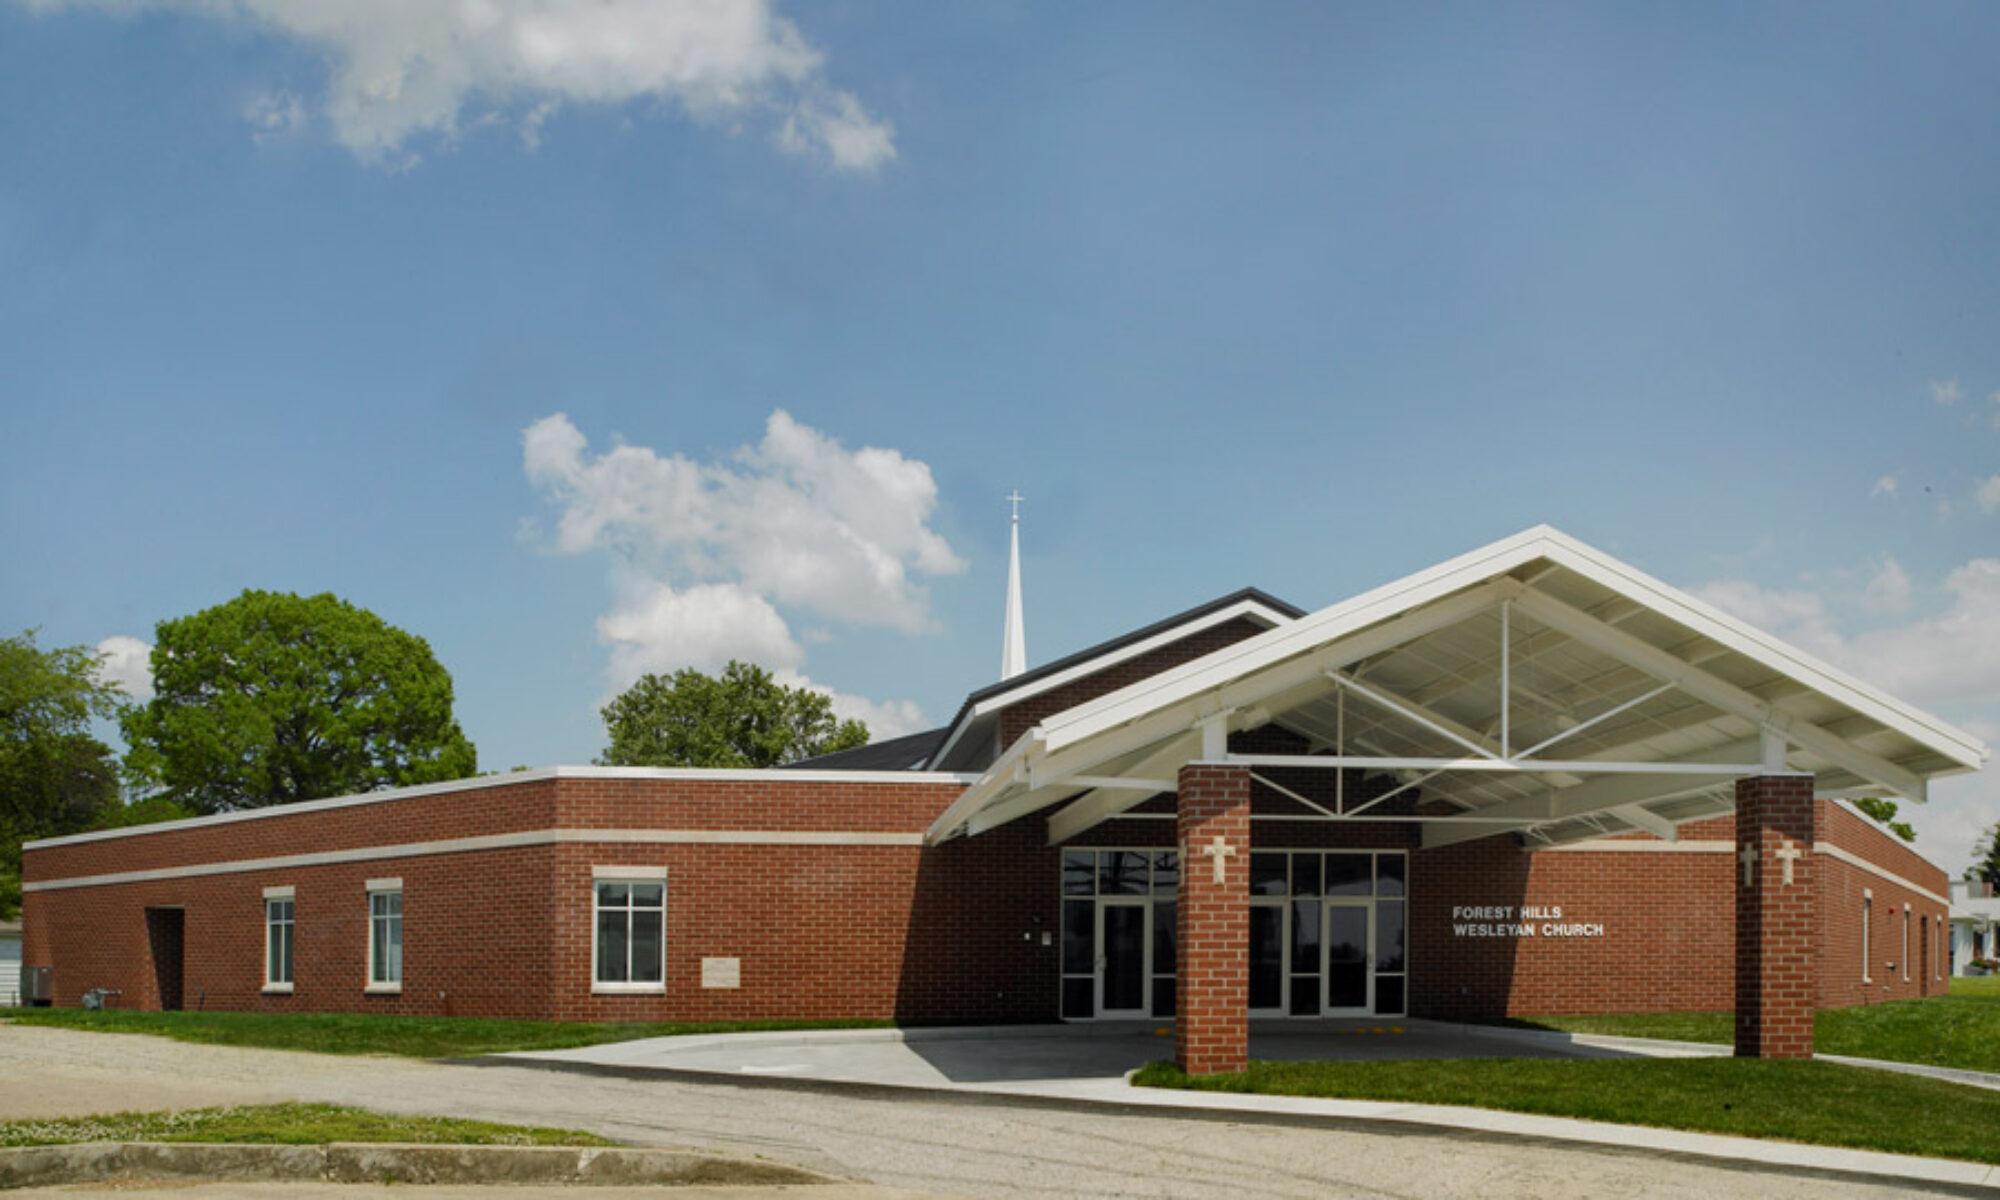 Forest Hills Wesleyan Church